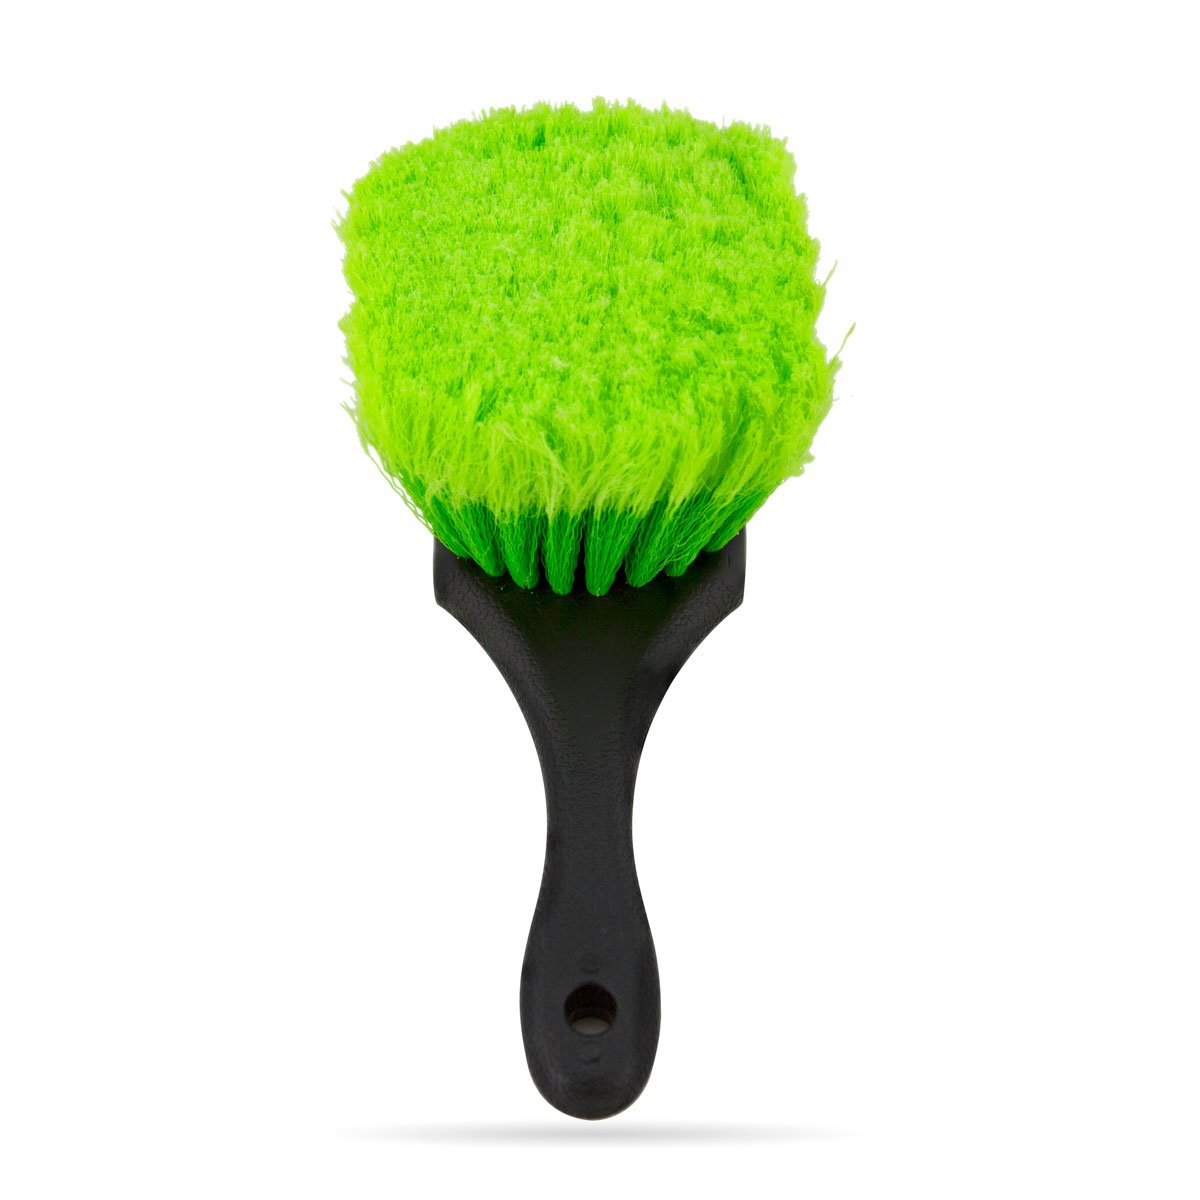 Slick Products Scrub Brush